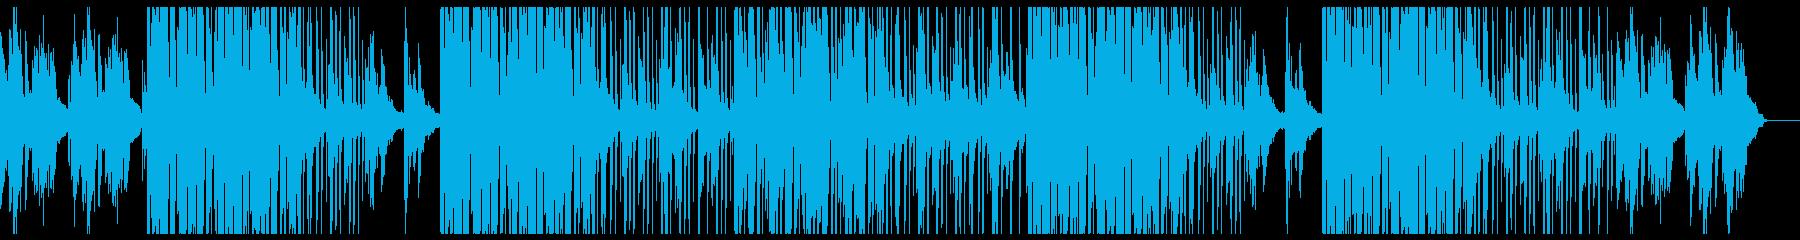 【Jazzy HipHop】BGMの再生済みの波形